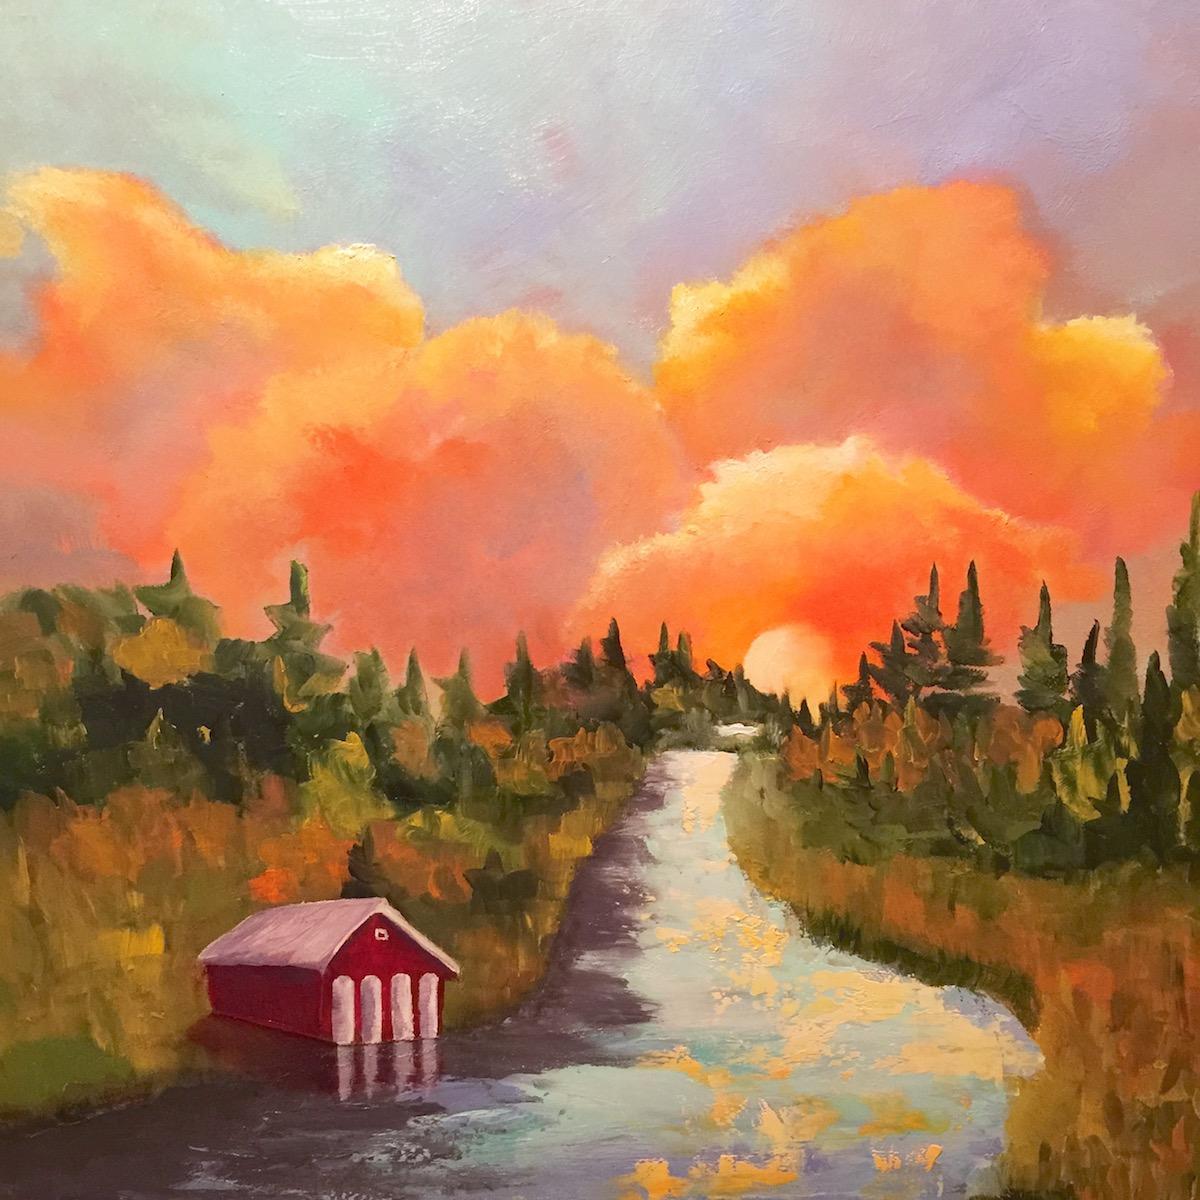 Leelanau Narrows - Painting by Stephanie Schlatter